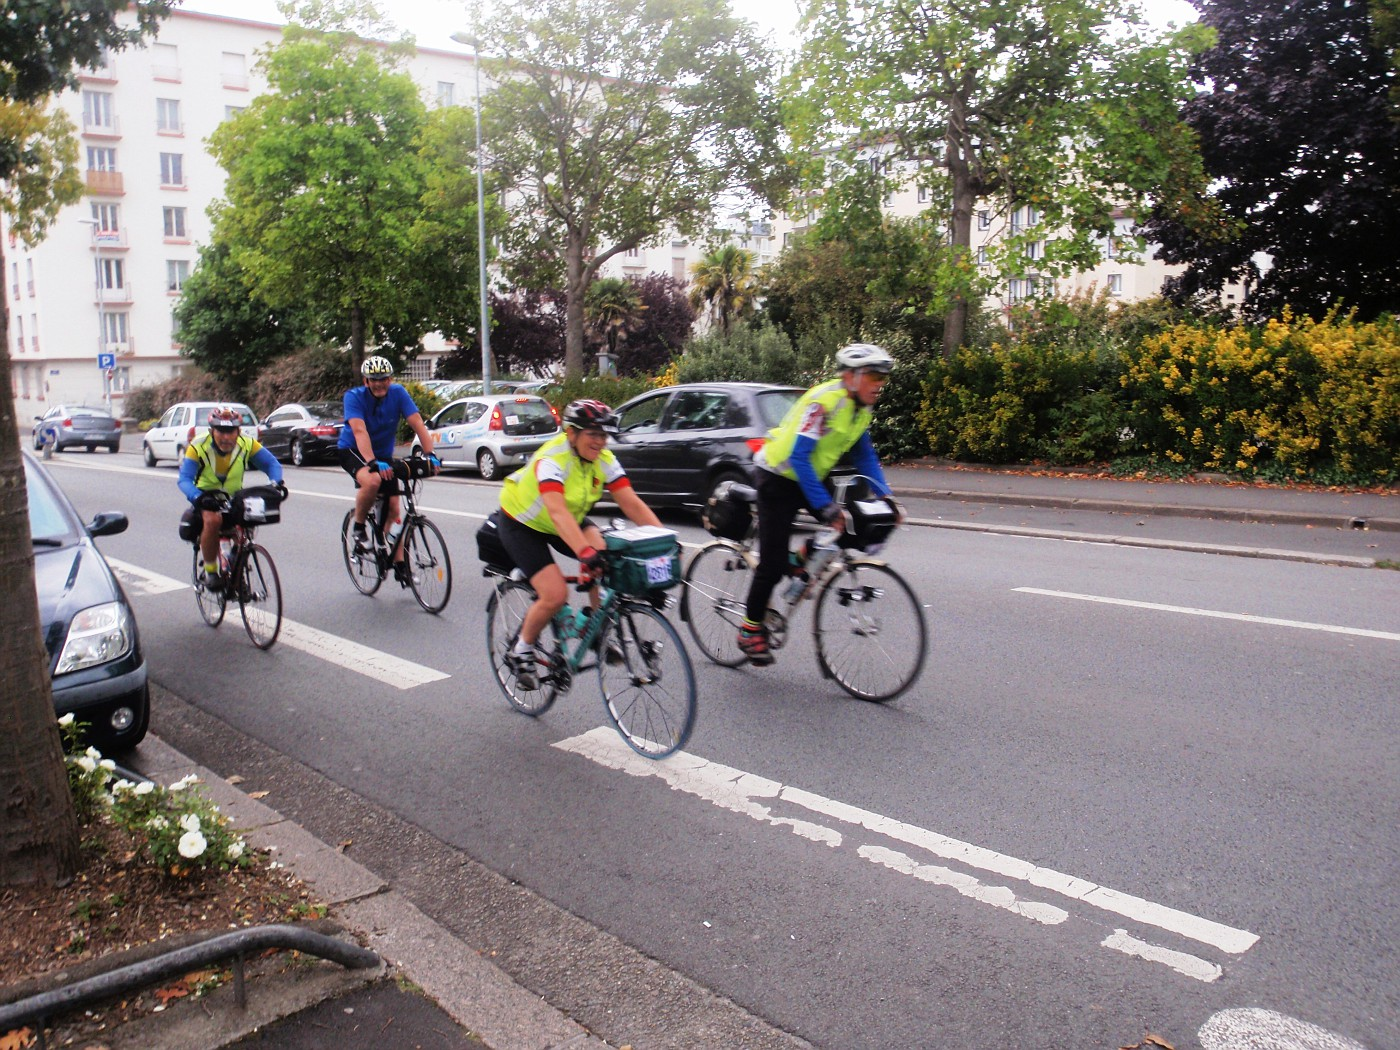 Arrival in Brest